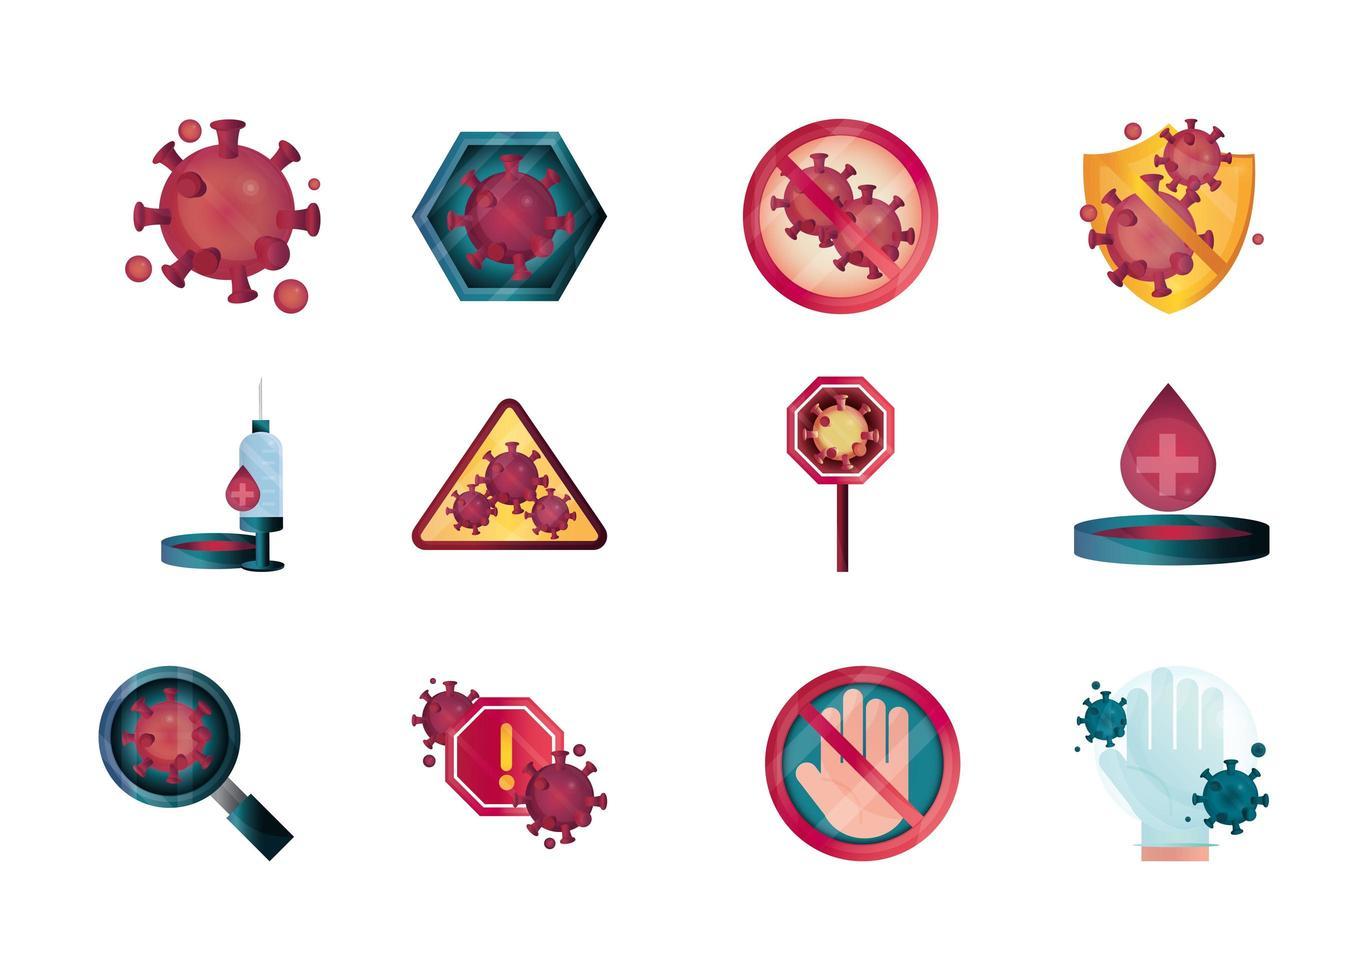 fermare le icone di coronavirus impostate vettore